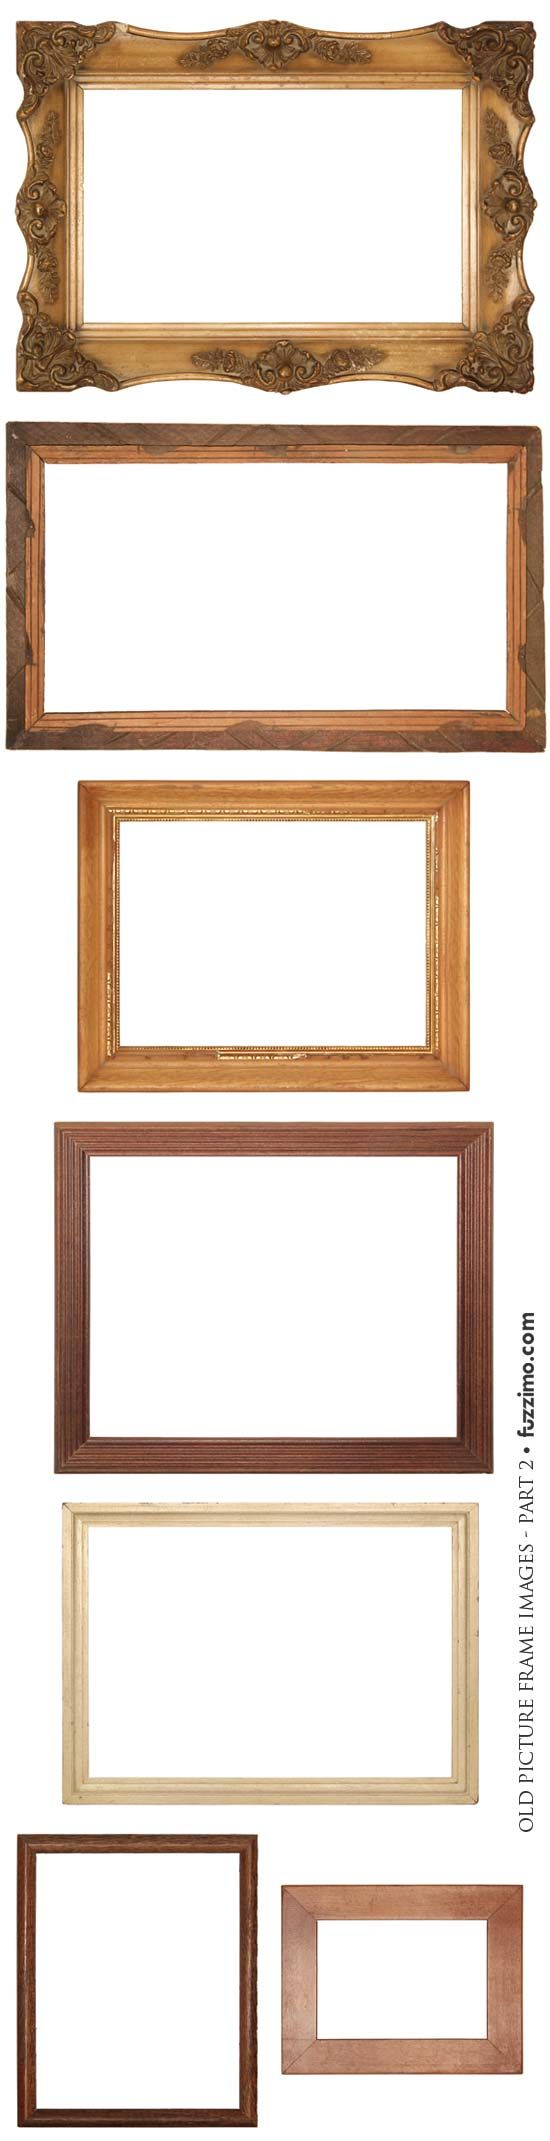 free hi-res old picture frame images